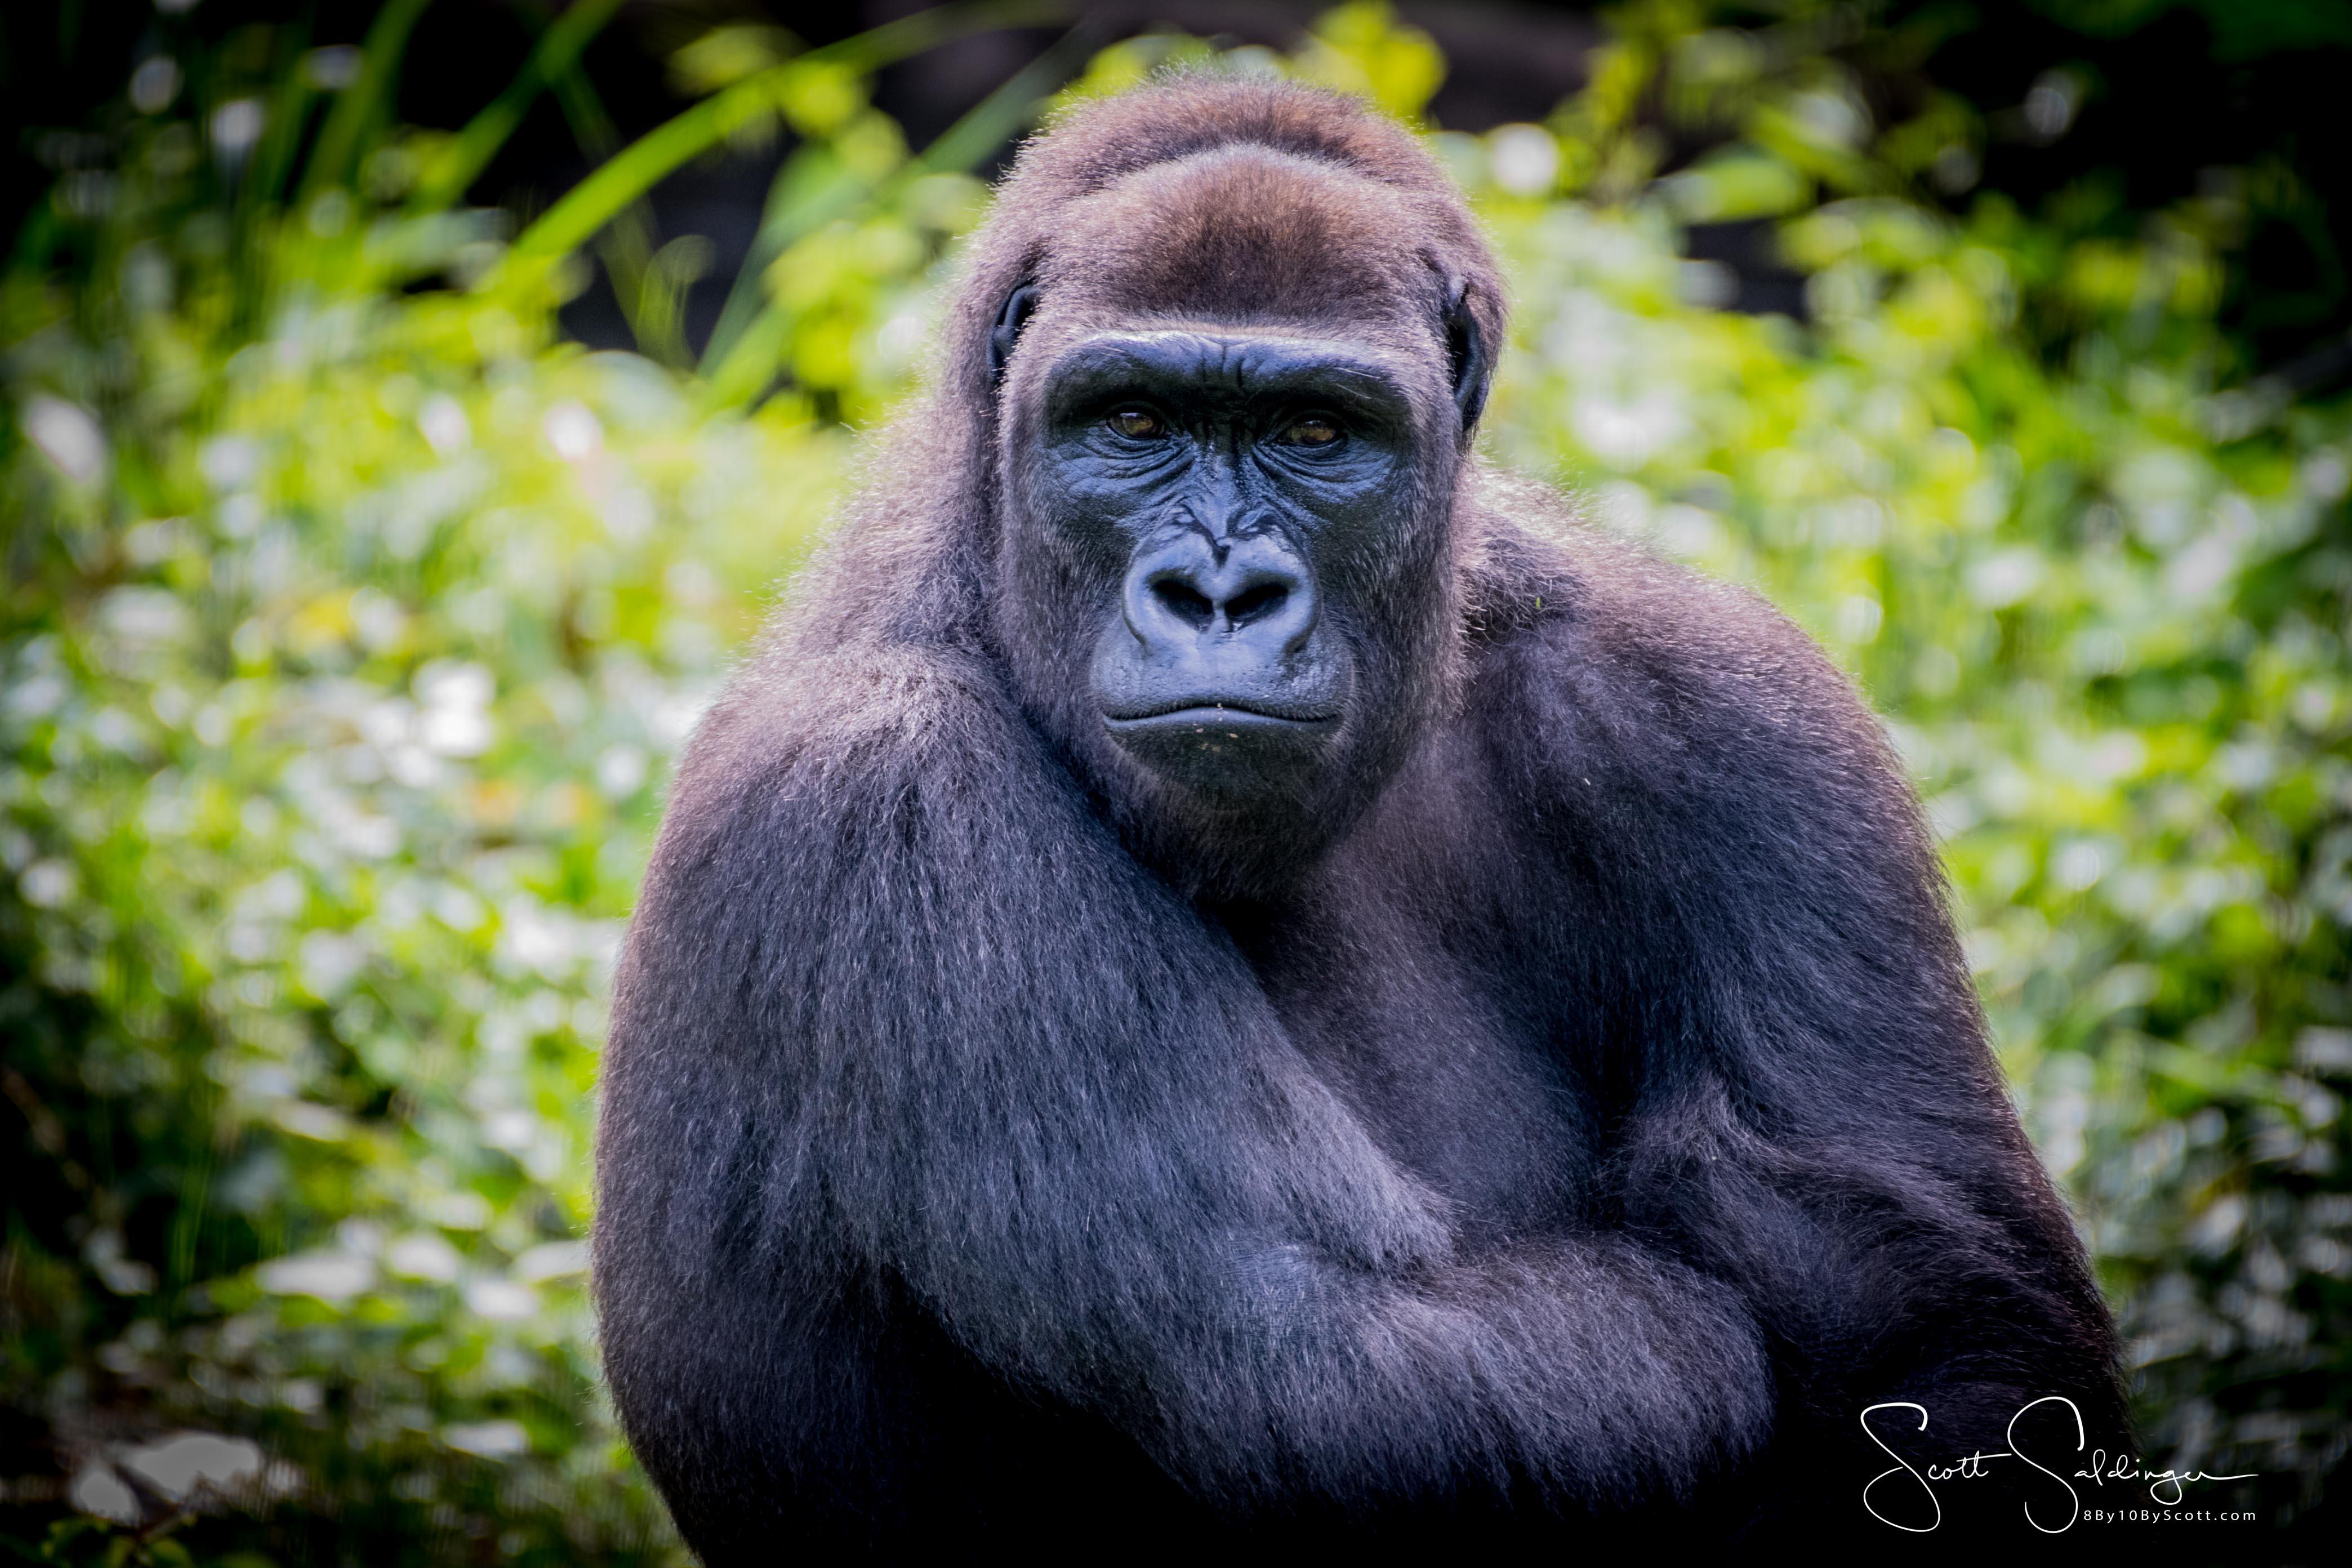 Apes-5514